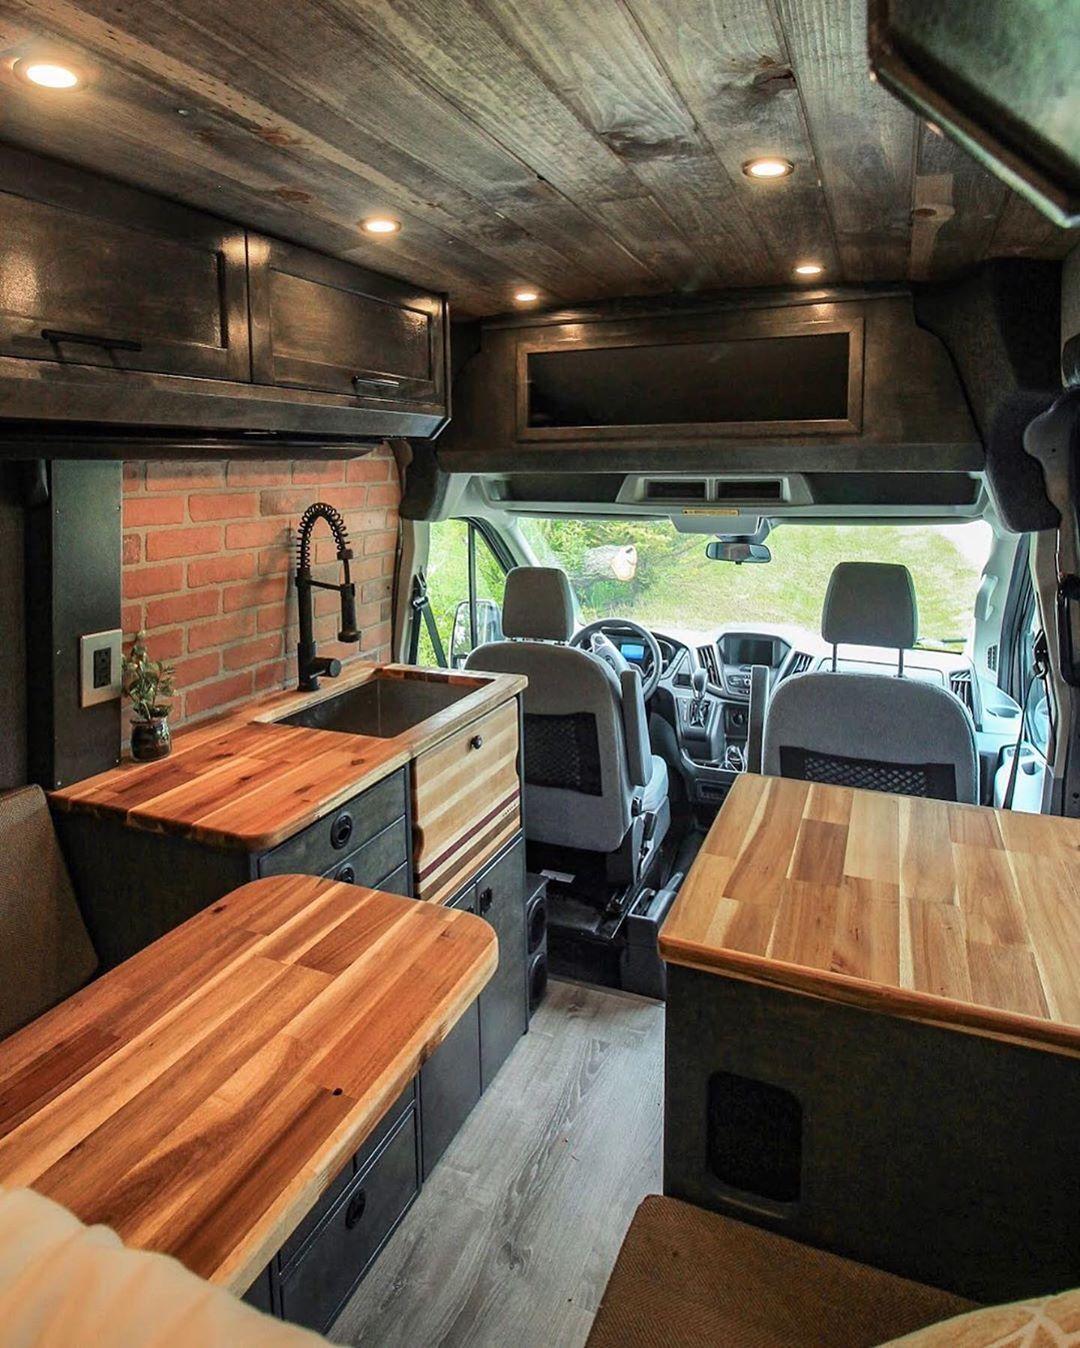 Cozy Log Cabin On Instagram Thoughts On A Cabin Van Yay Or Nay Gorgeus By Freedomvans Please Fol Van Life Campervan Interior Van Living